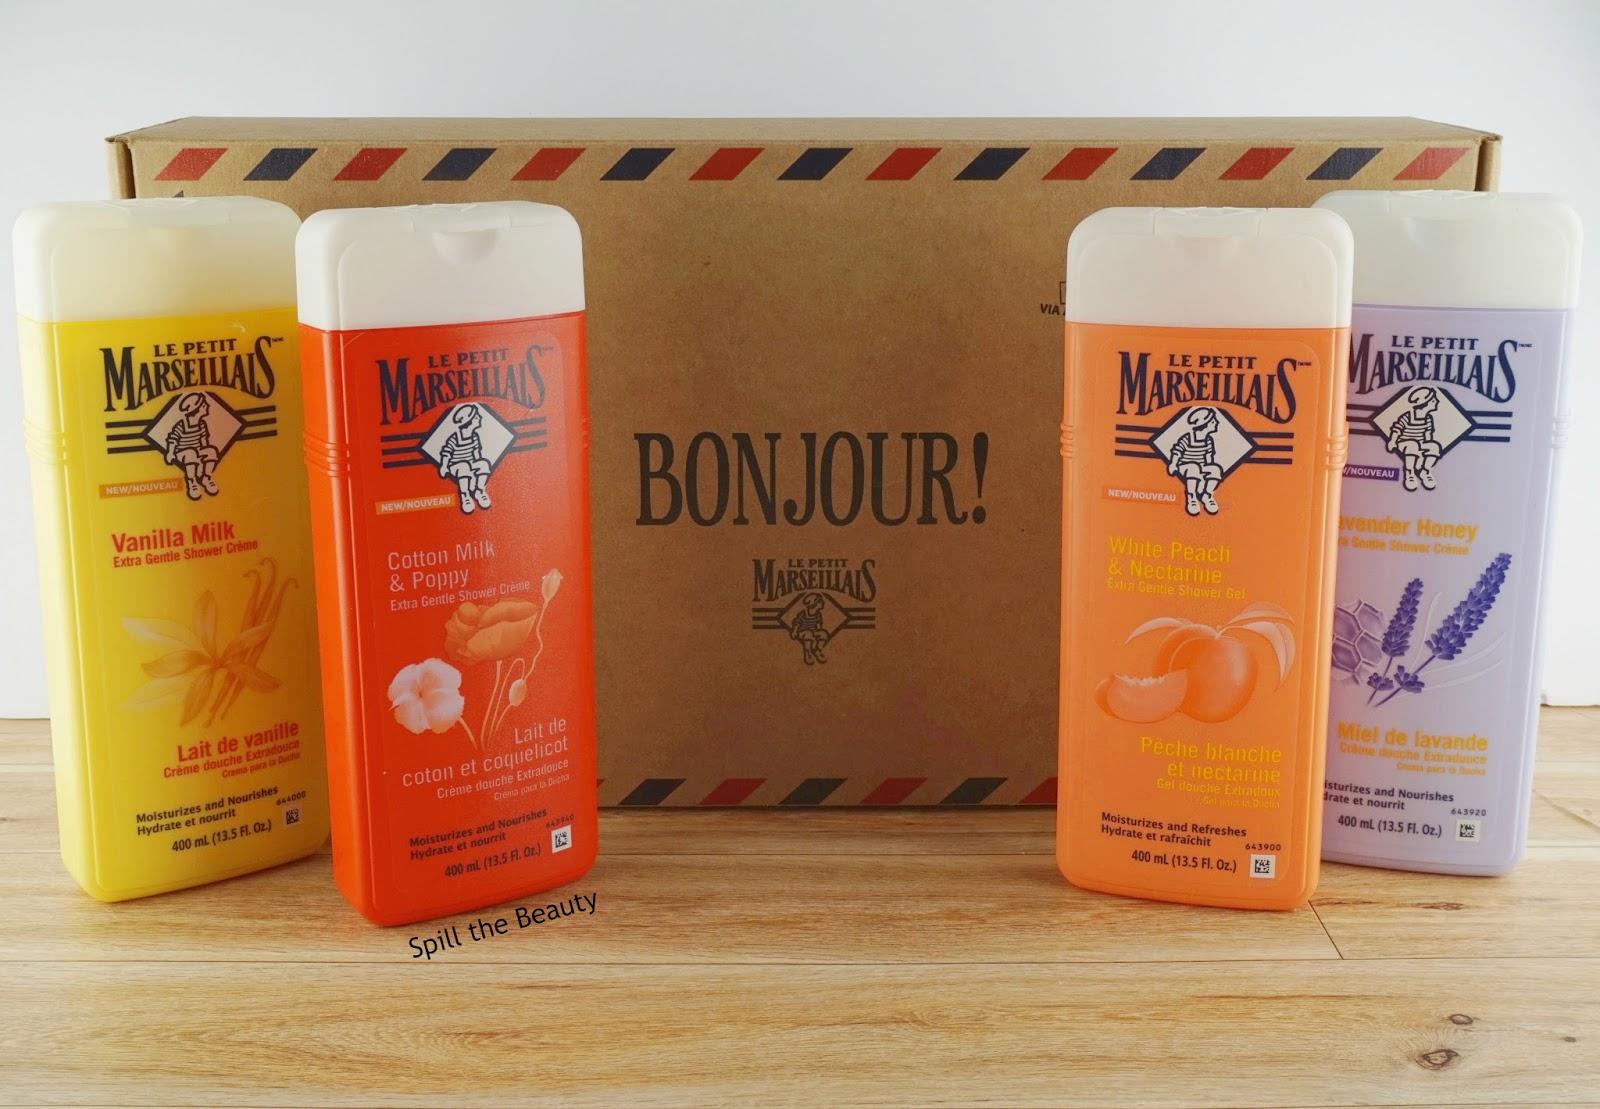 Le Petit Marseillais Extra Gentle Shower Products